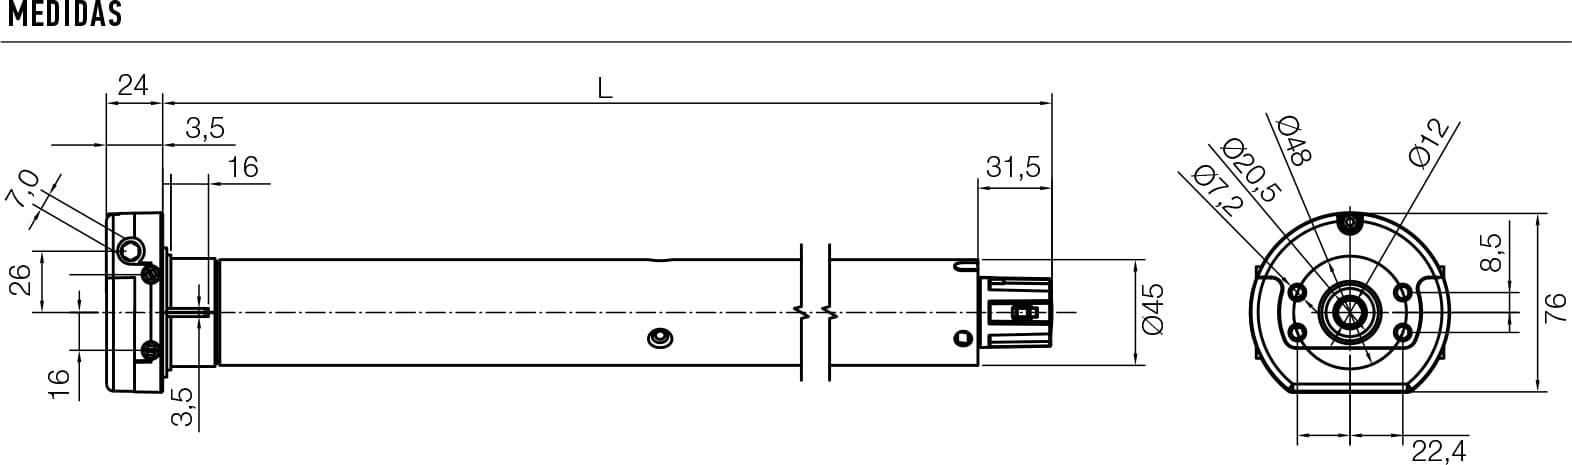 Era MH 4012